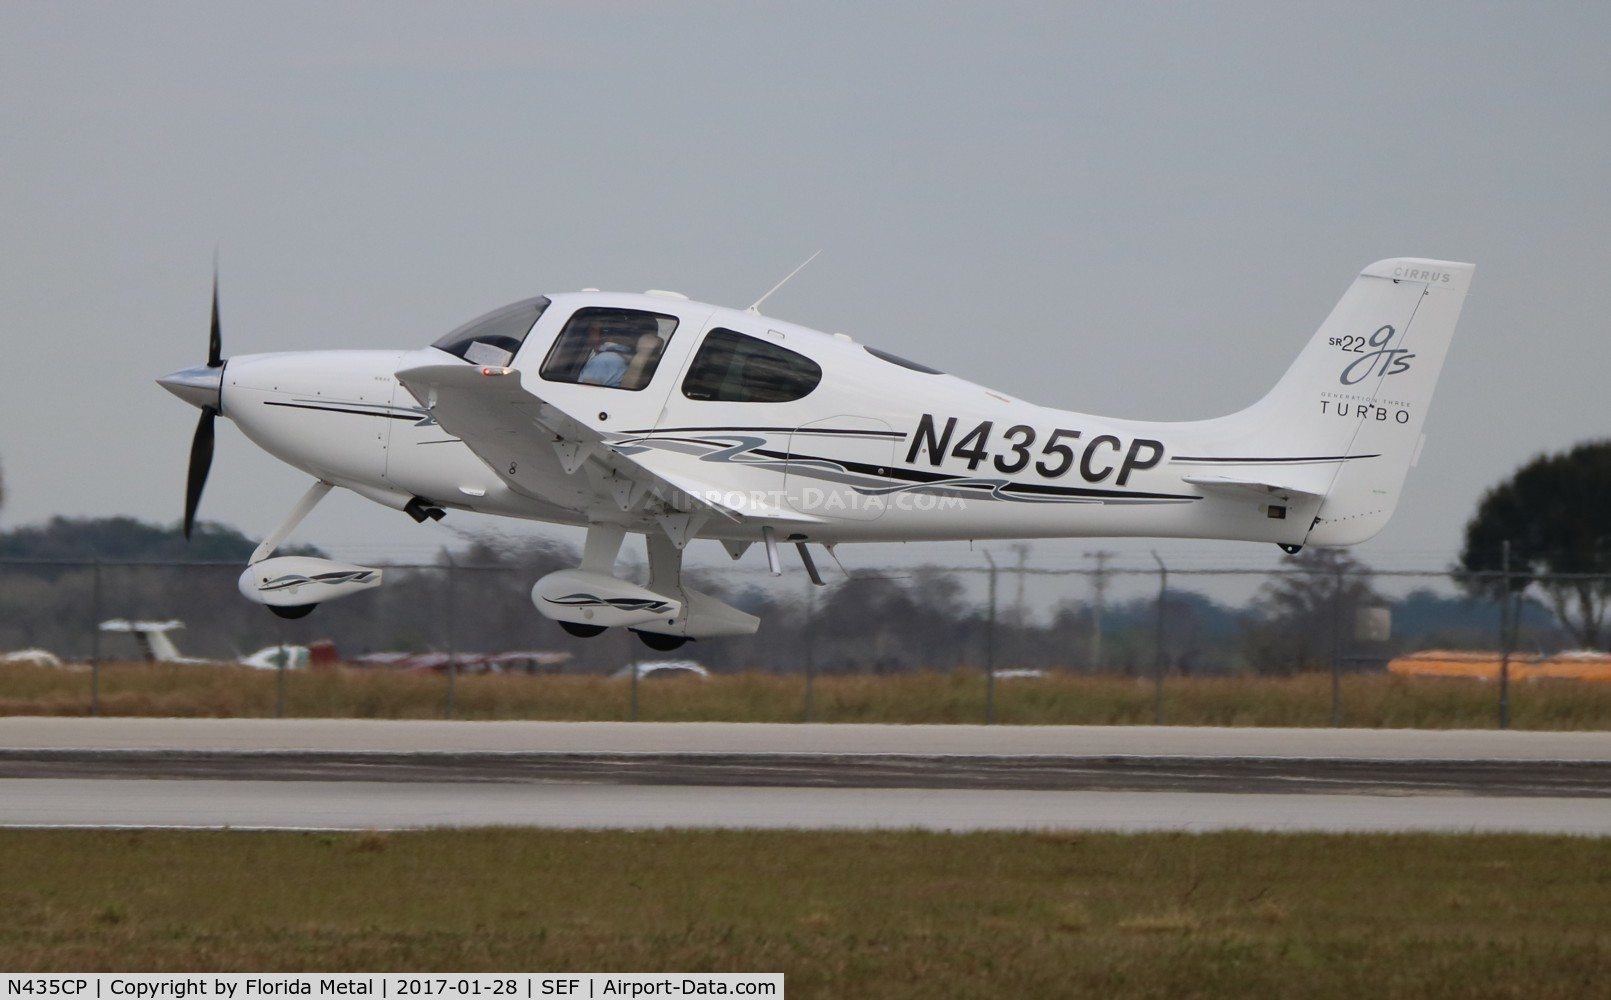 N435CP, 2008 Cirrus SR22 G3 GTS Turbo C/N 3264, Cirrus SR22